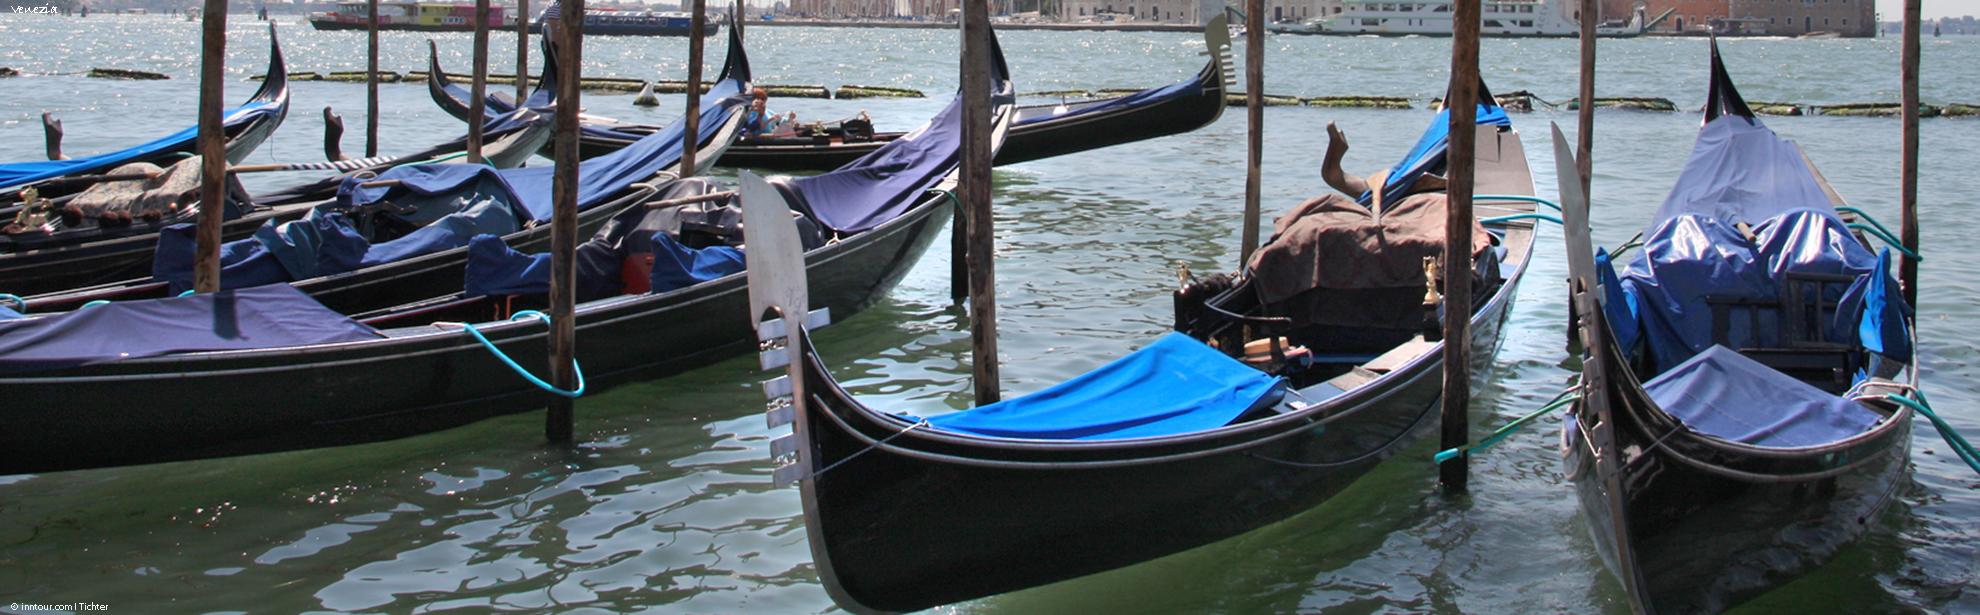 Oklassinntour_Tichter_Venezia_IMG_3405